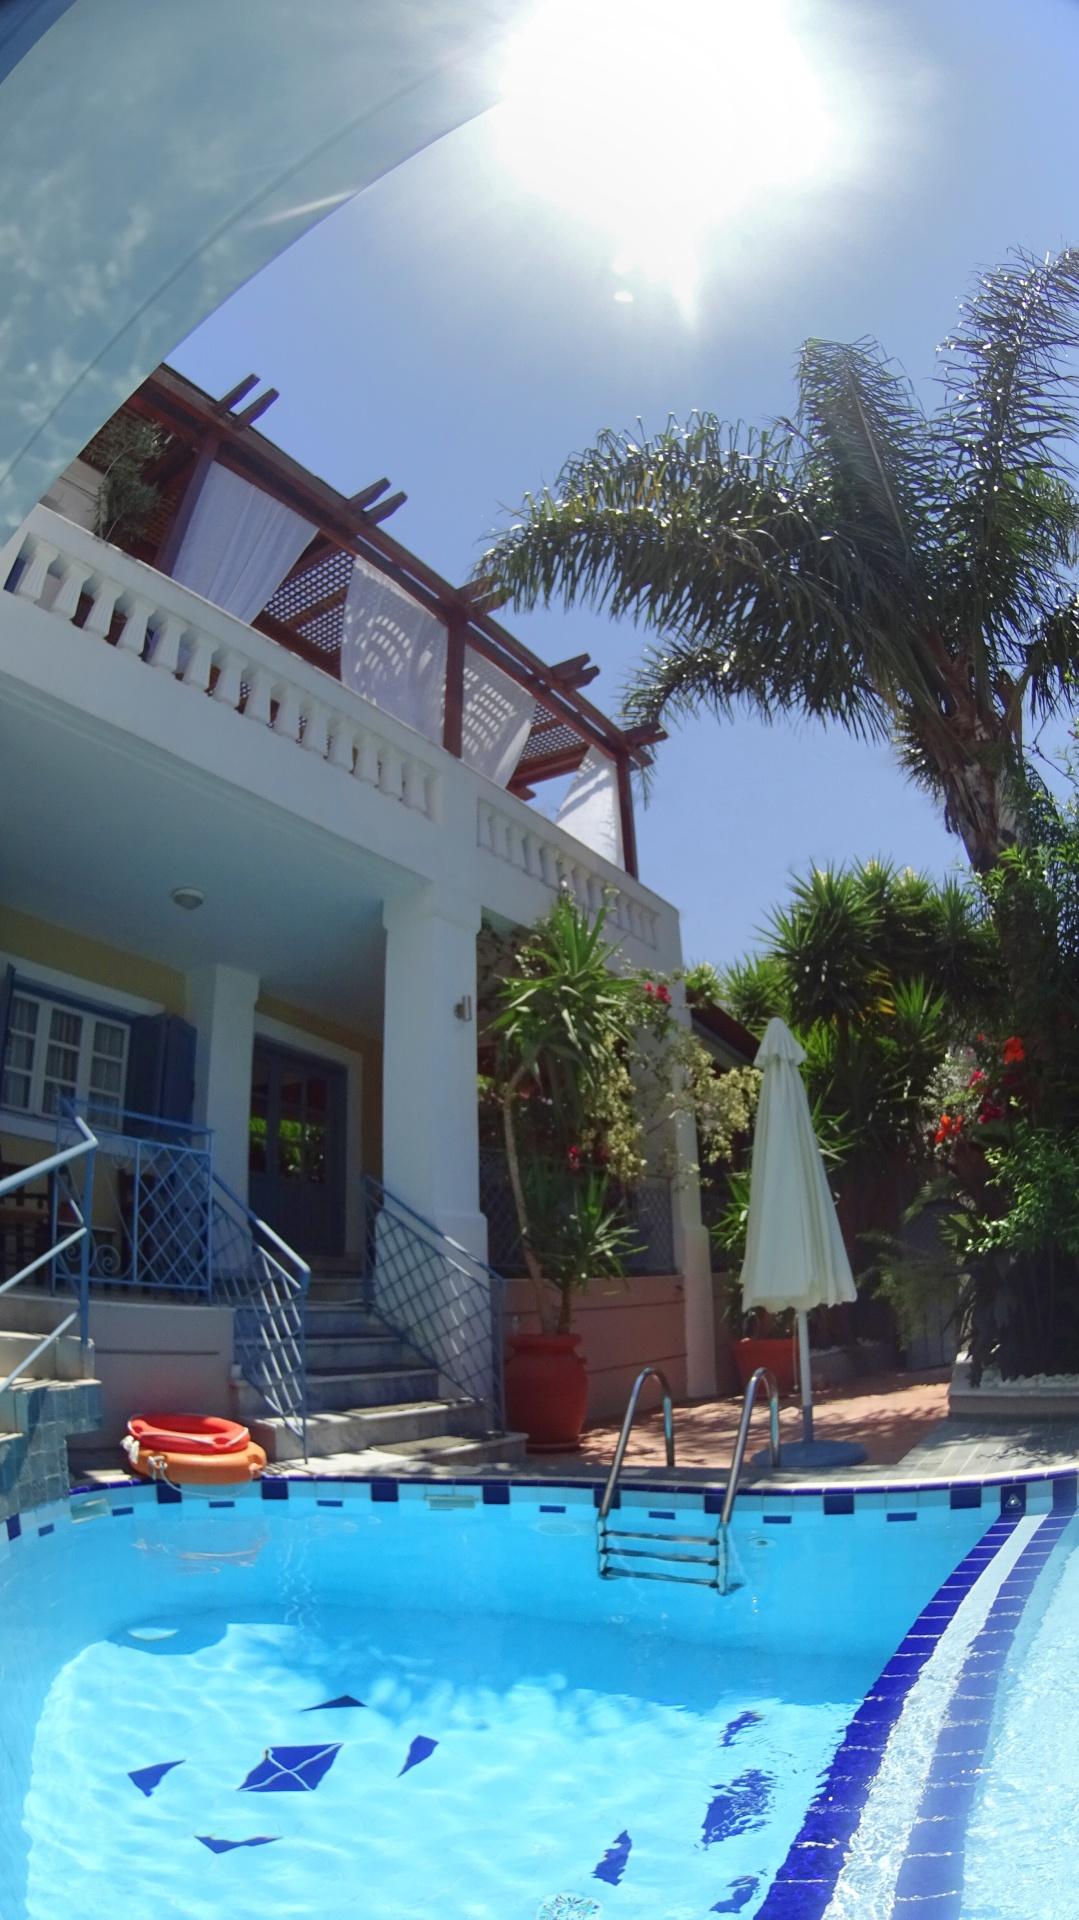 Riad style & greek island architecture